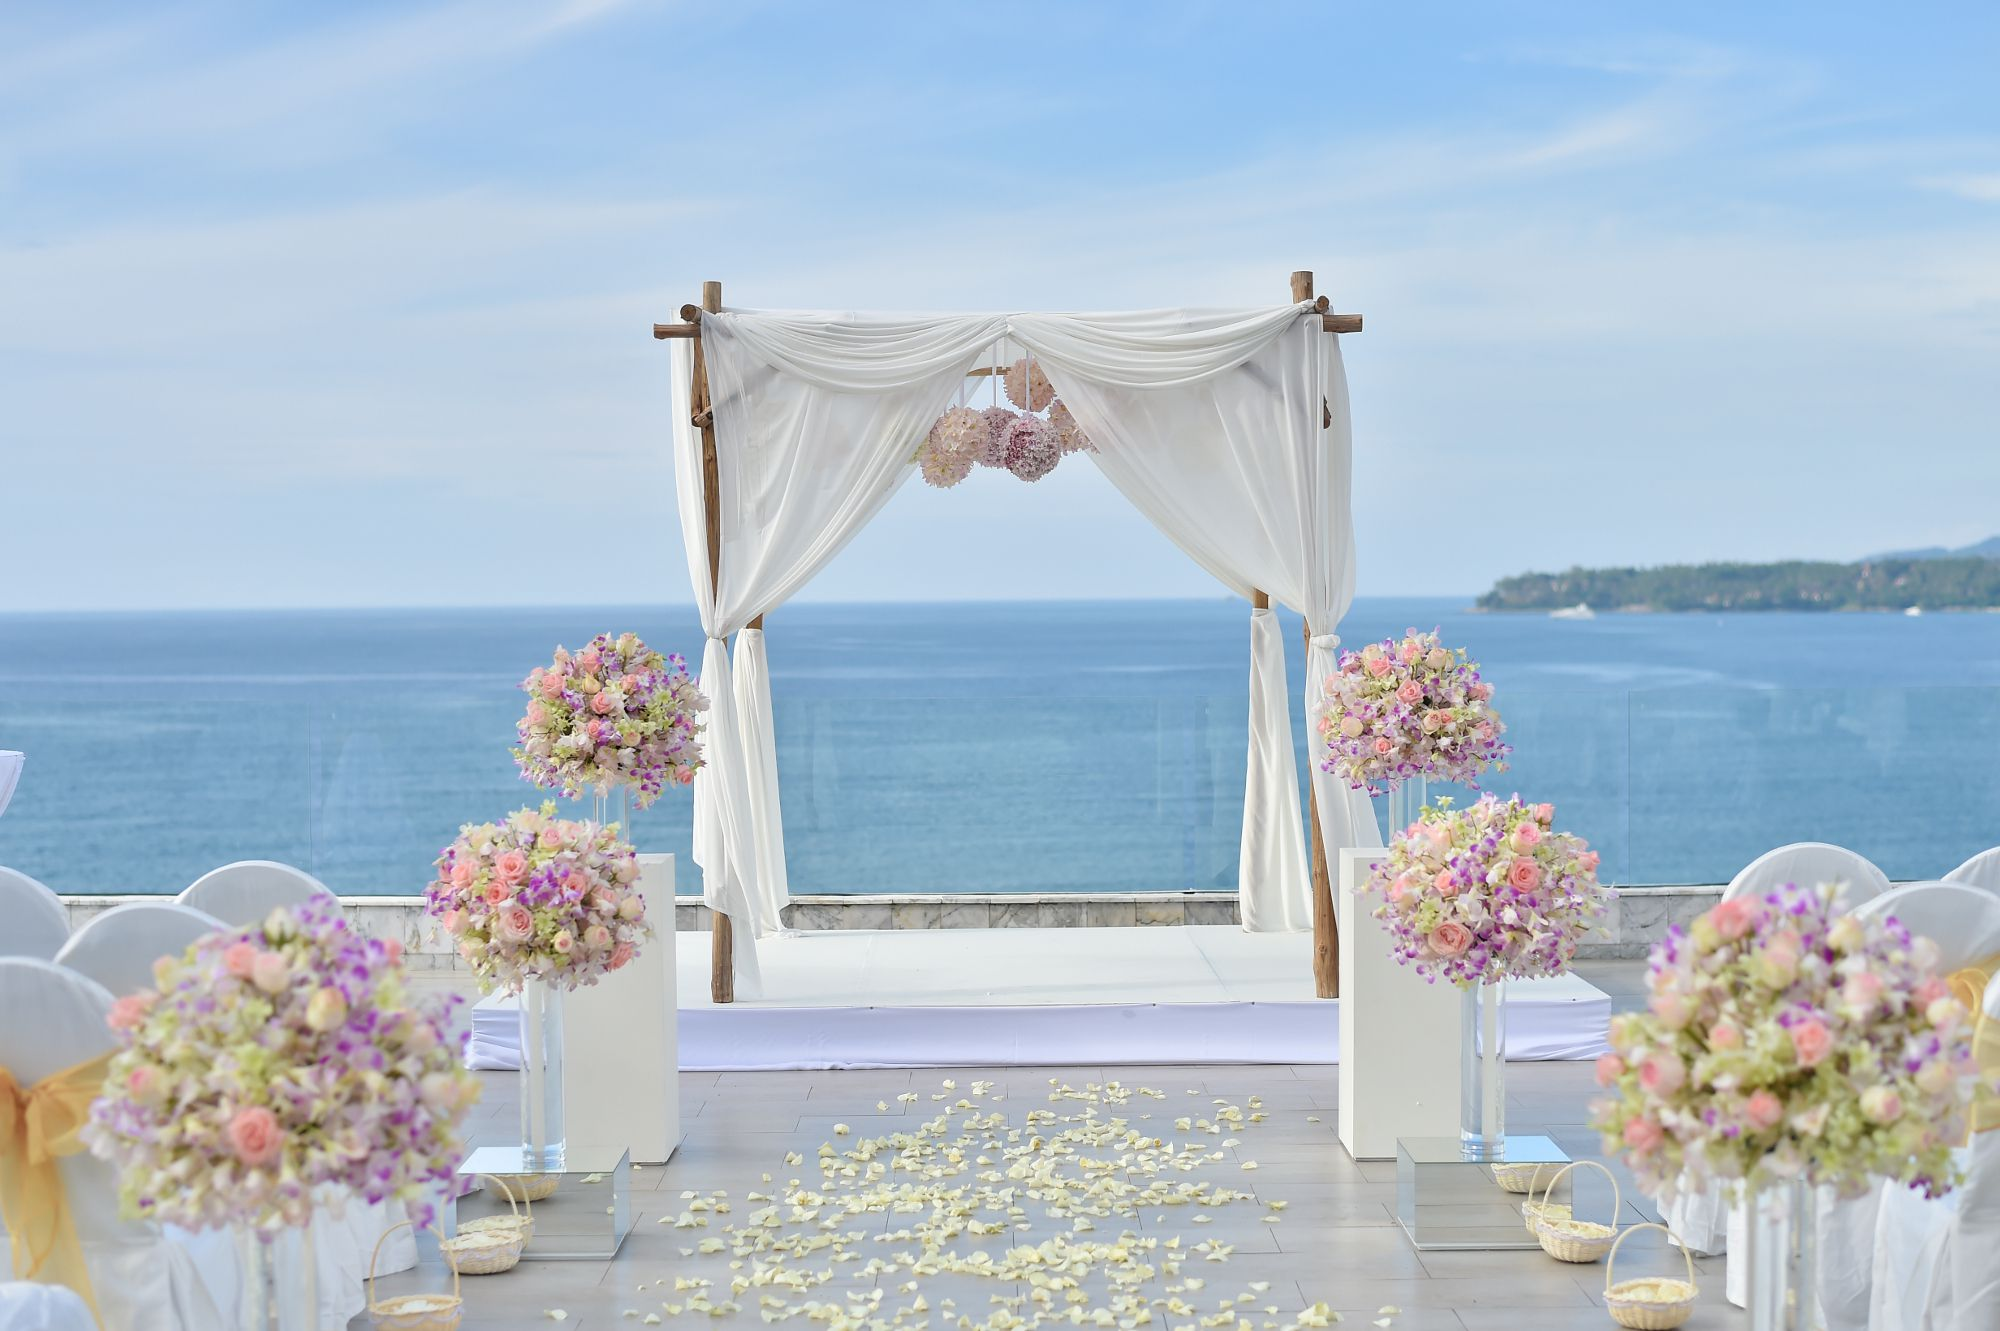 Wedding Destination - Matimonio in Spiaggia